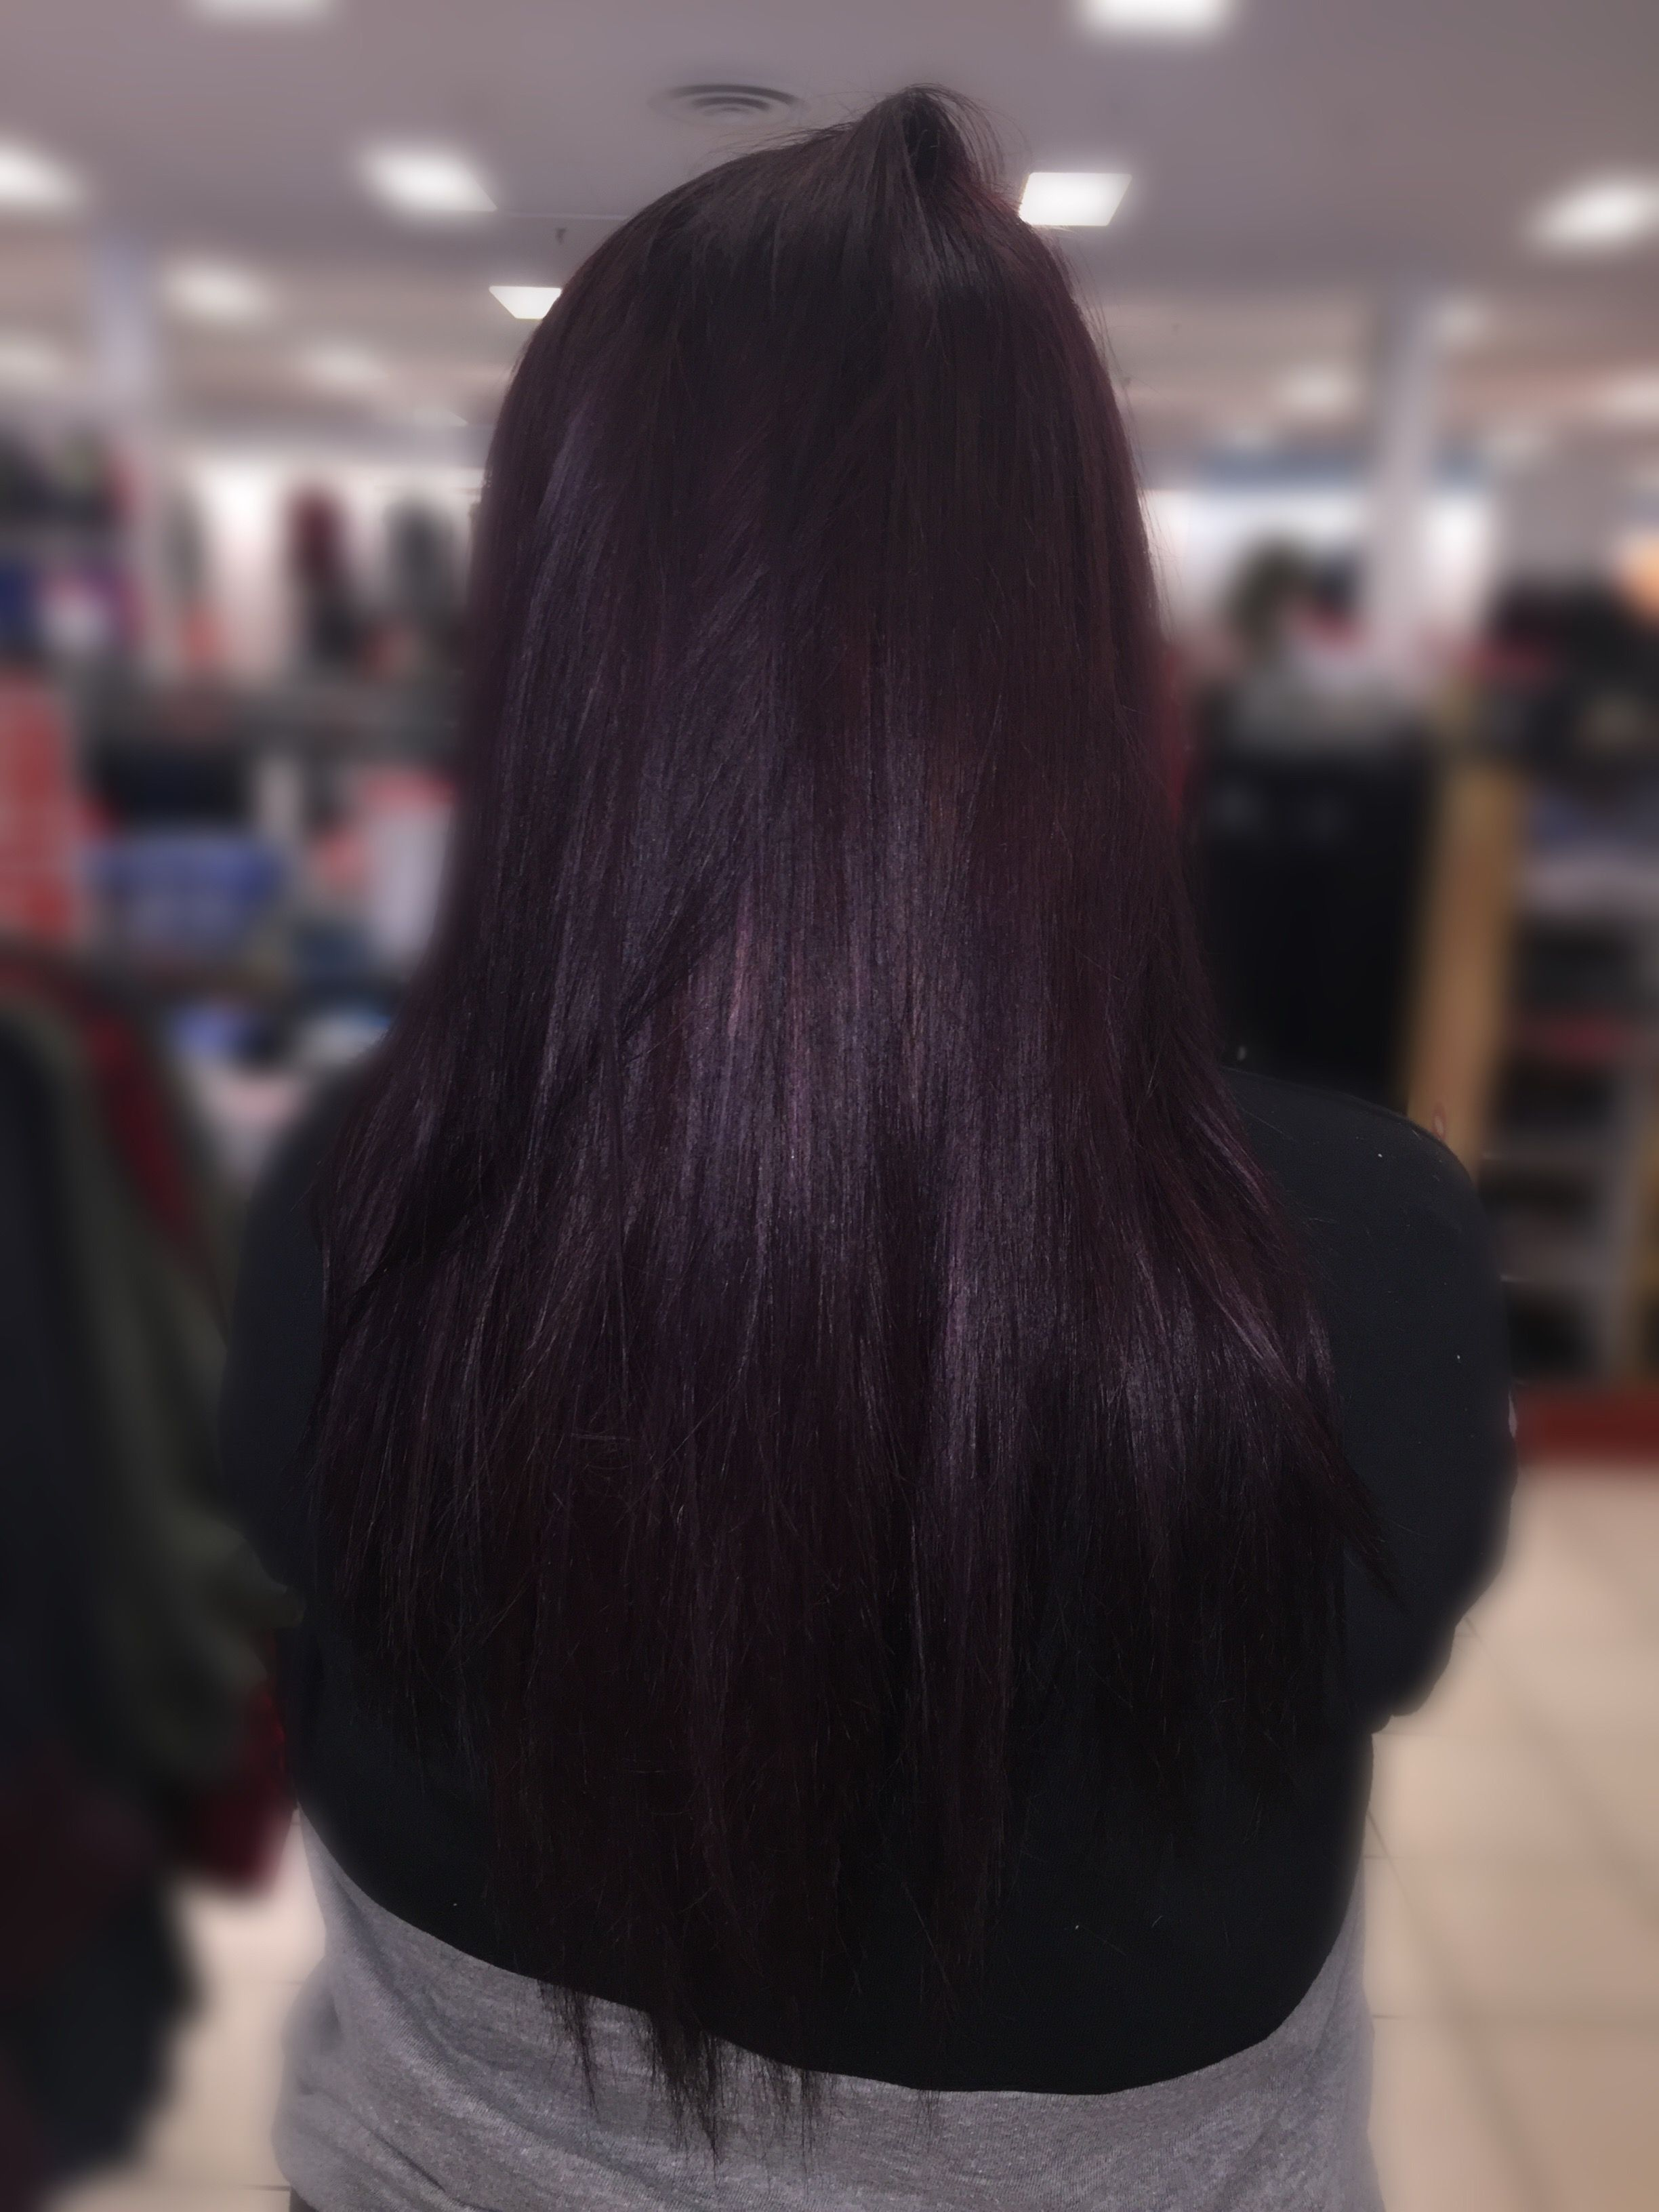 Plum Brown Hair In 2019 Plum Brown Hair Hair Color Hair